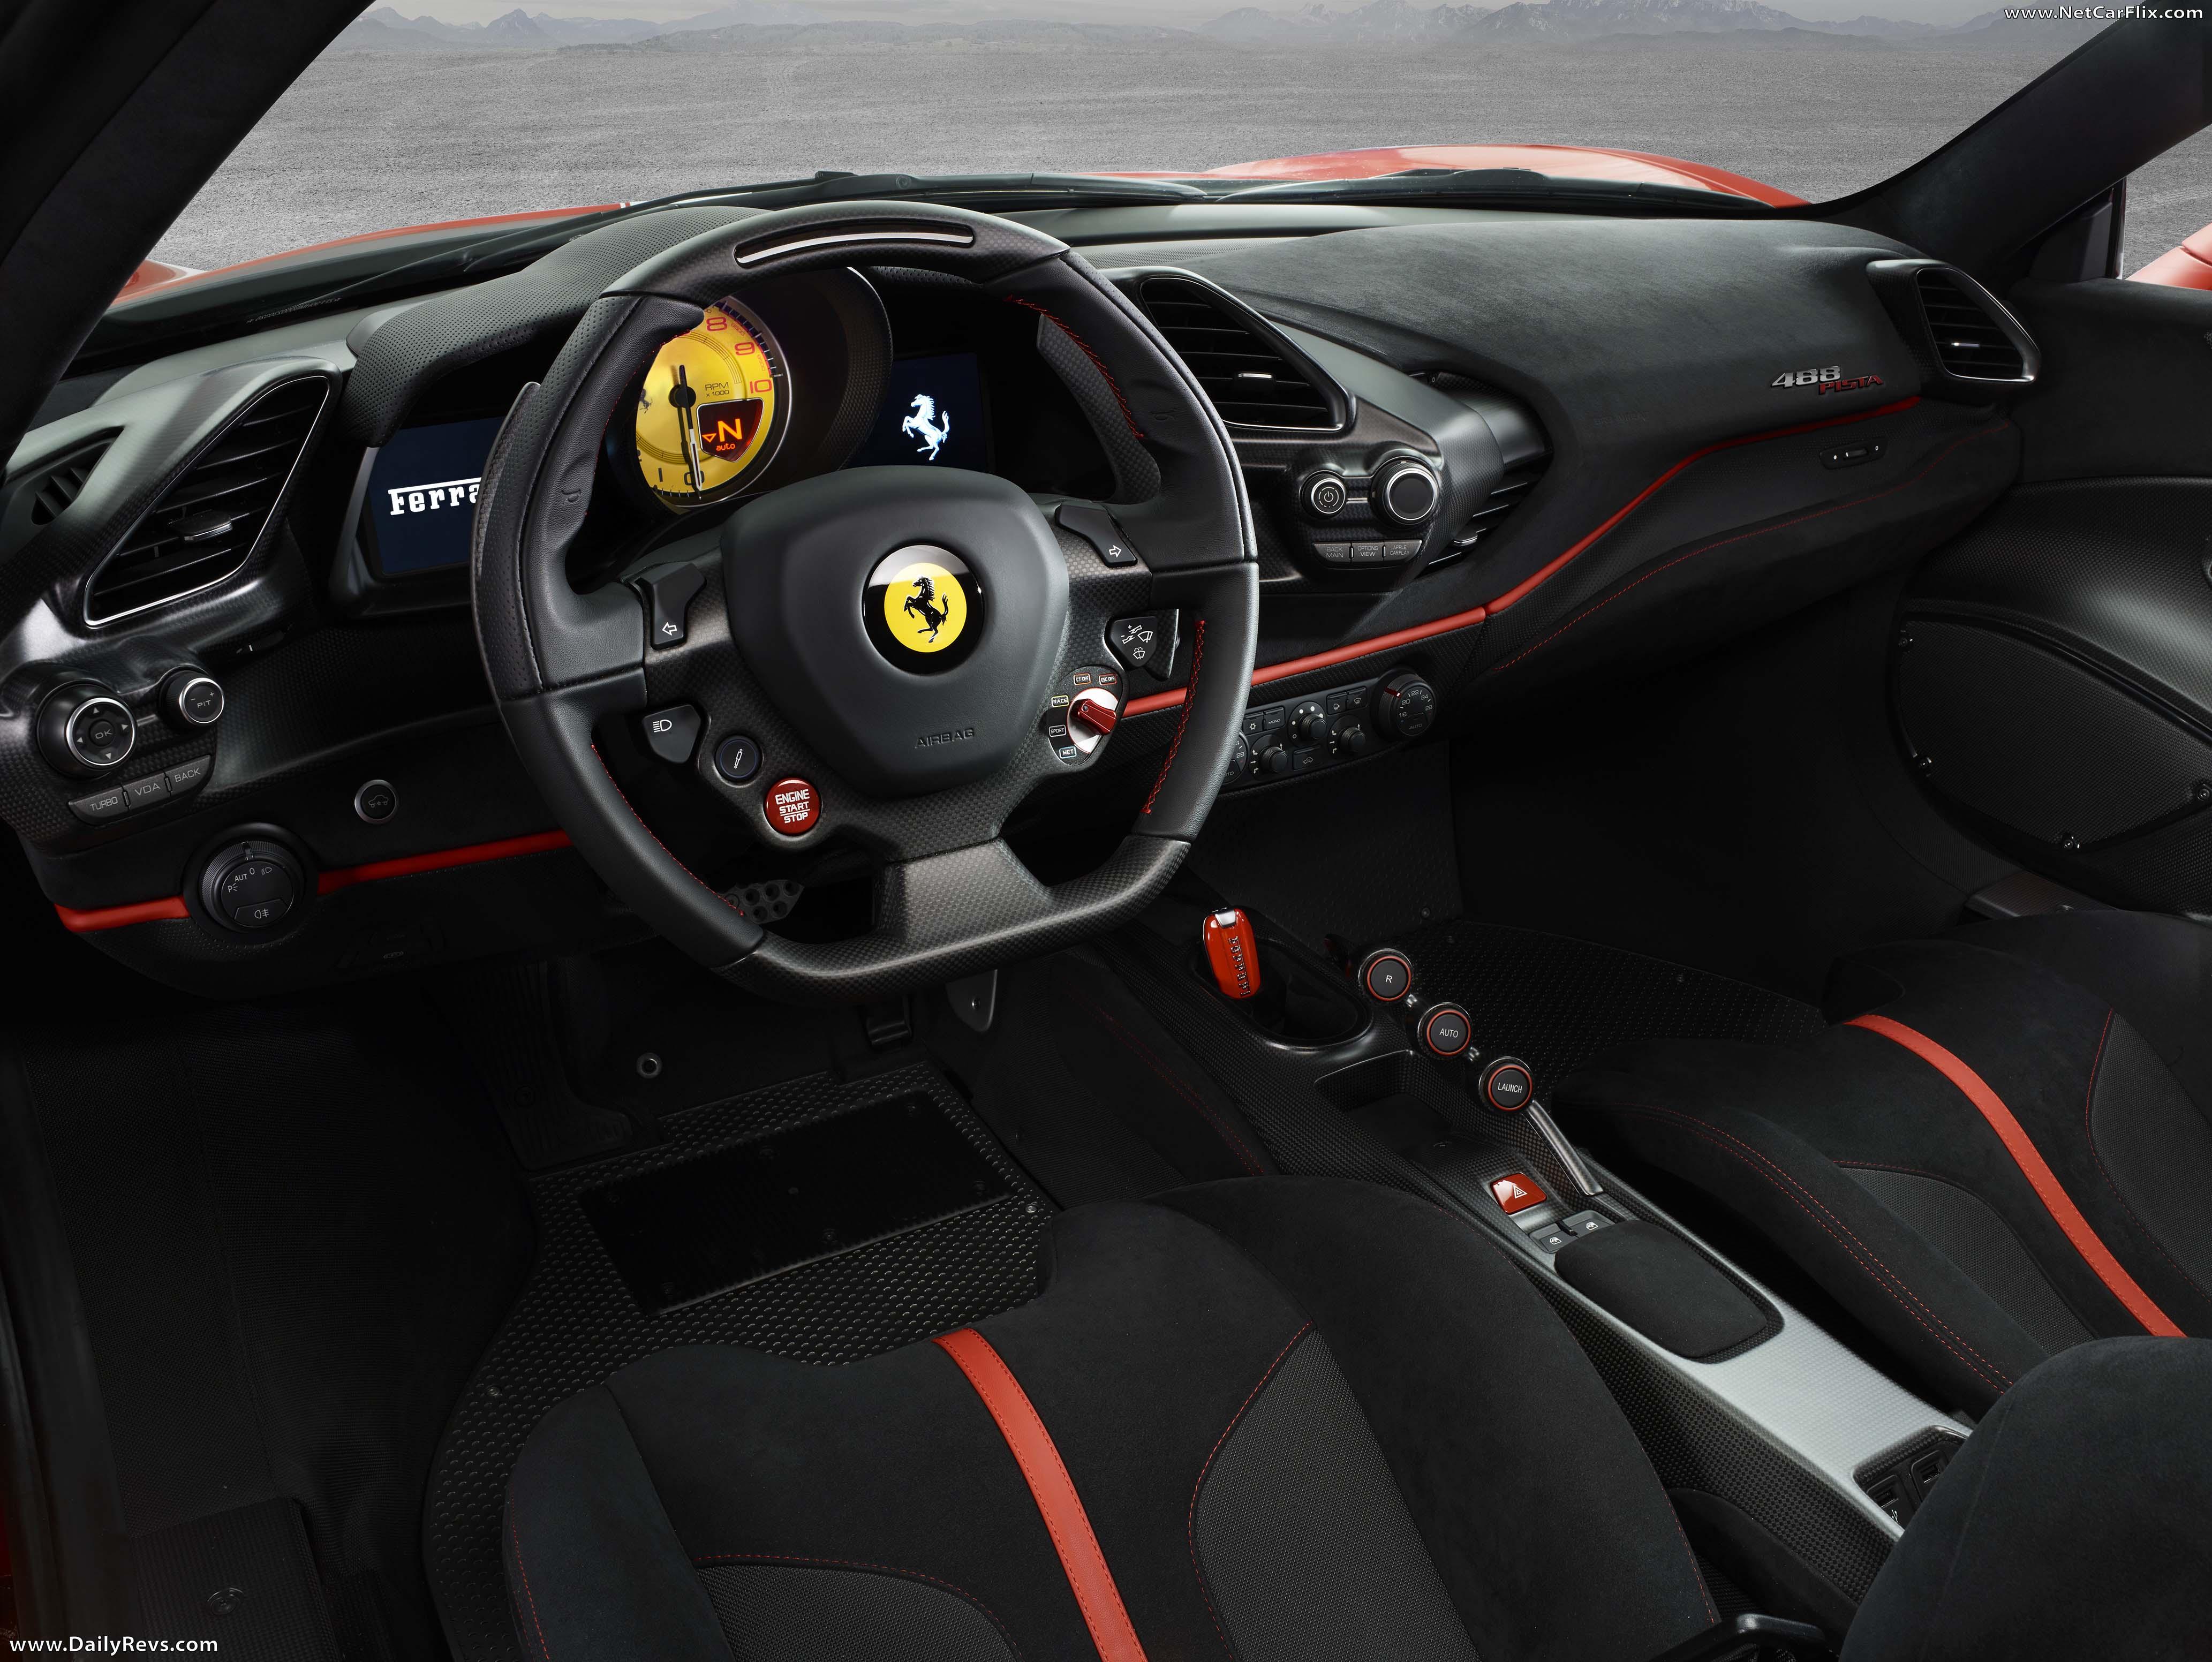 2019 Ferrari 488 Pista full